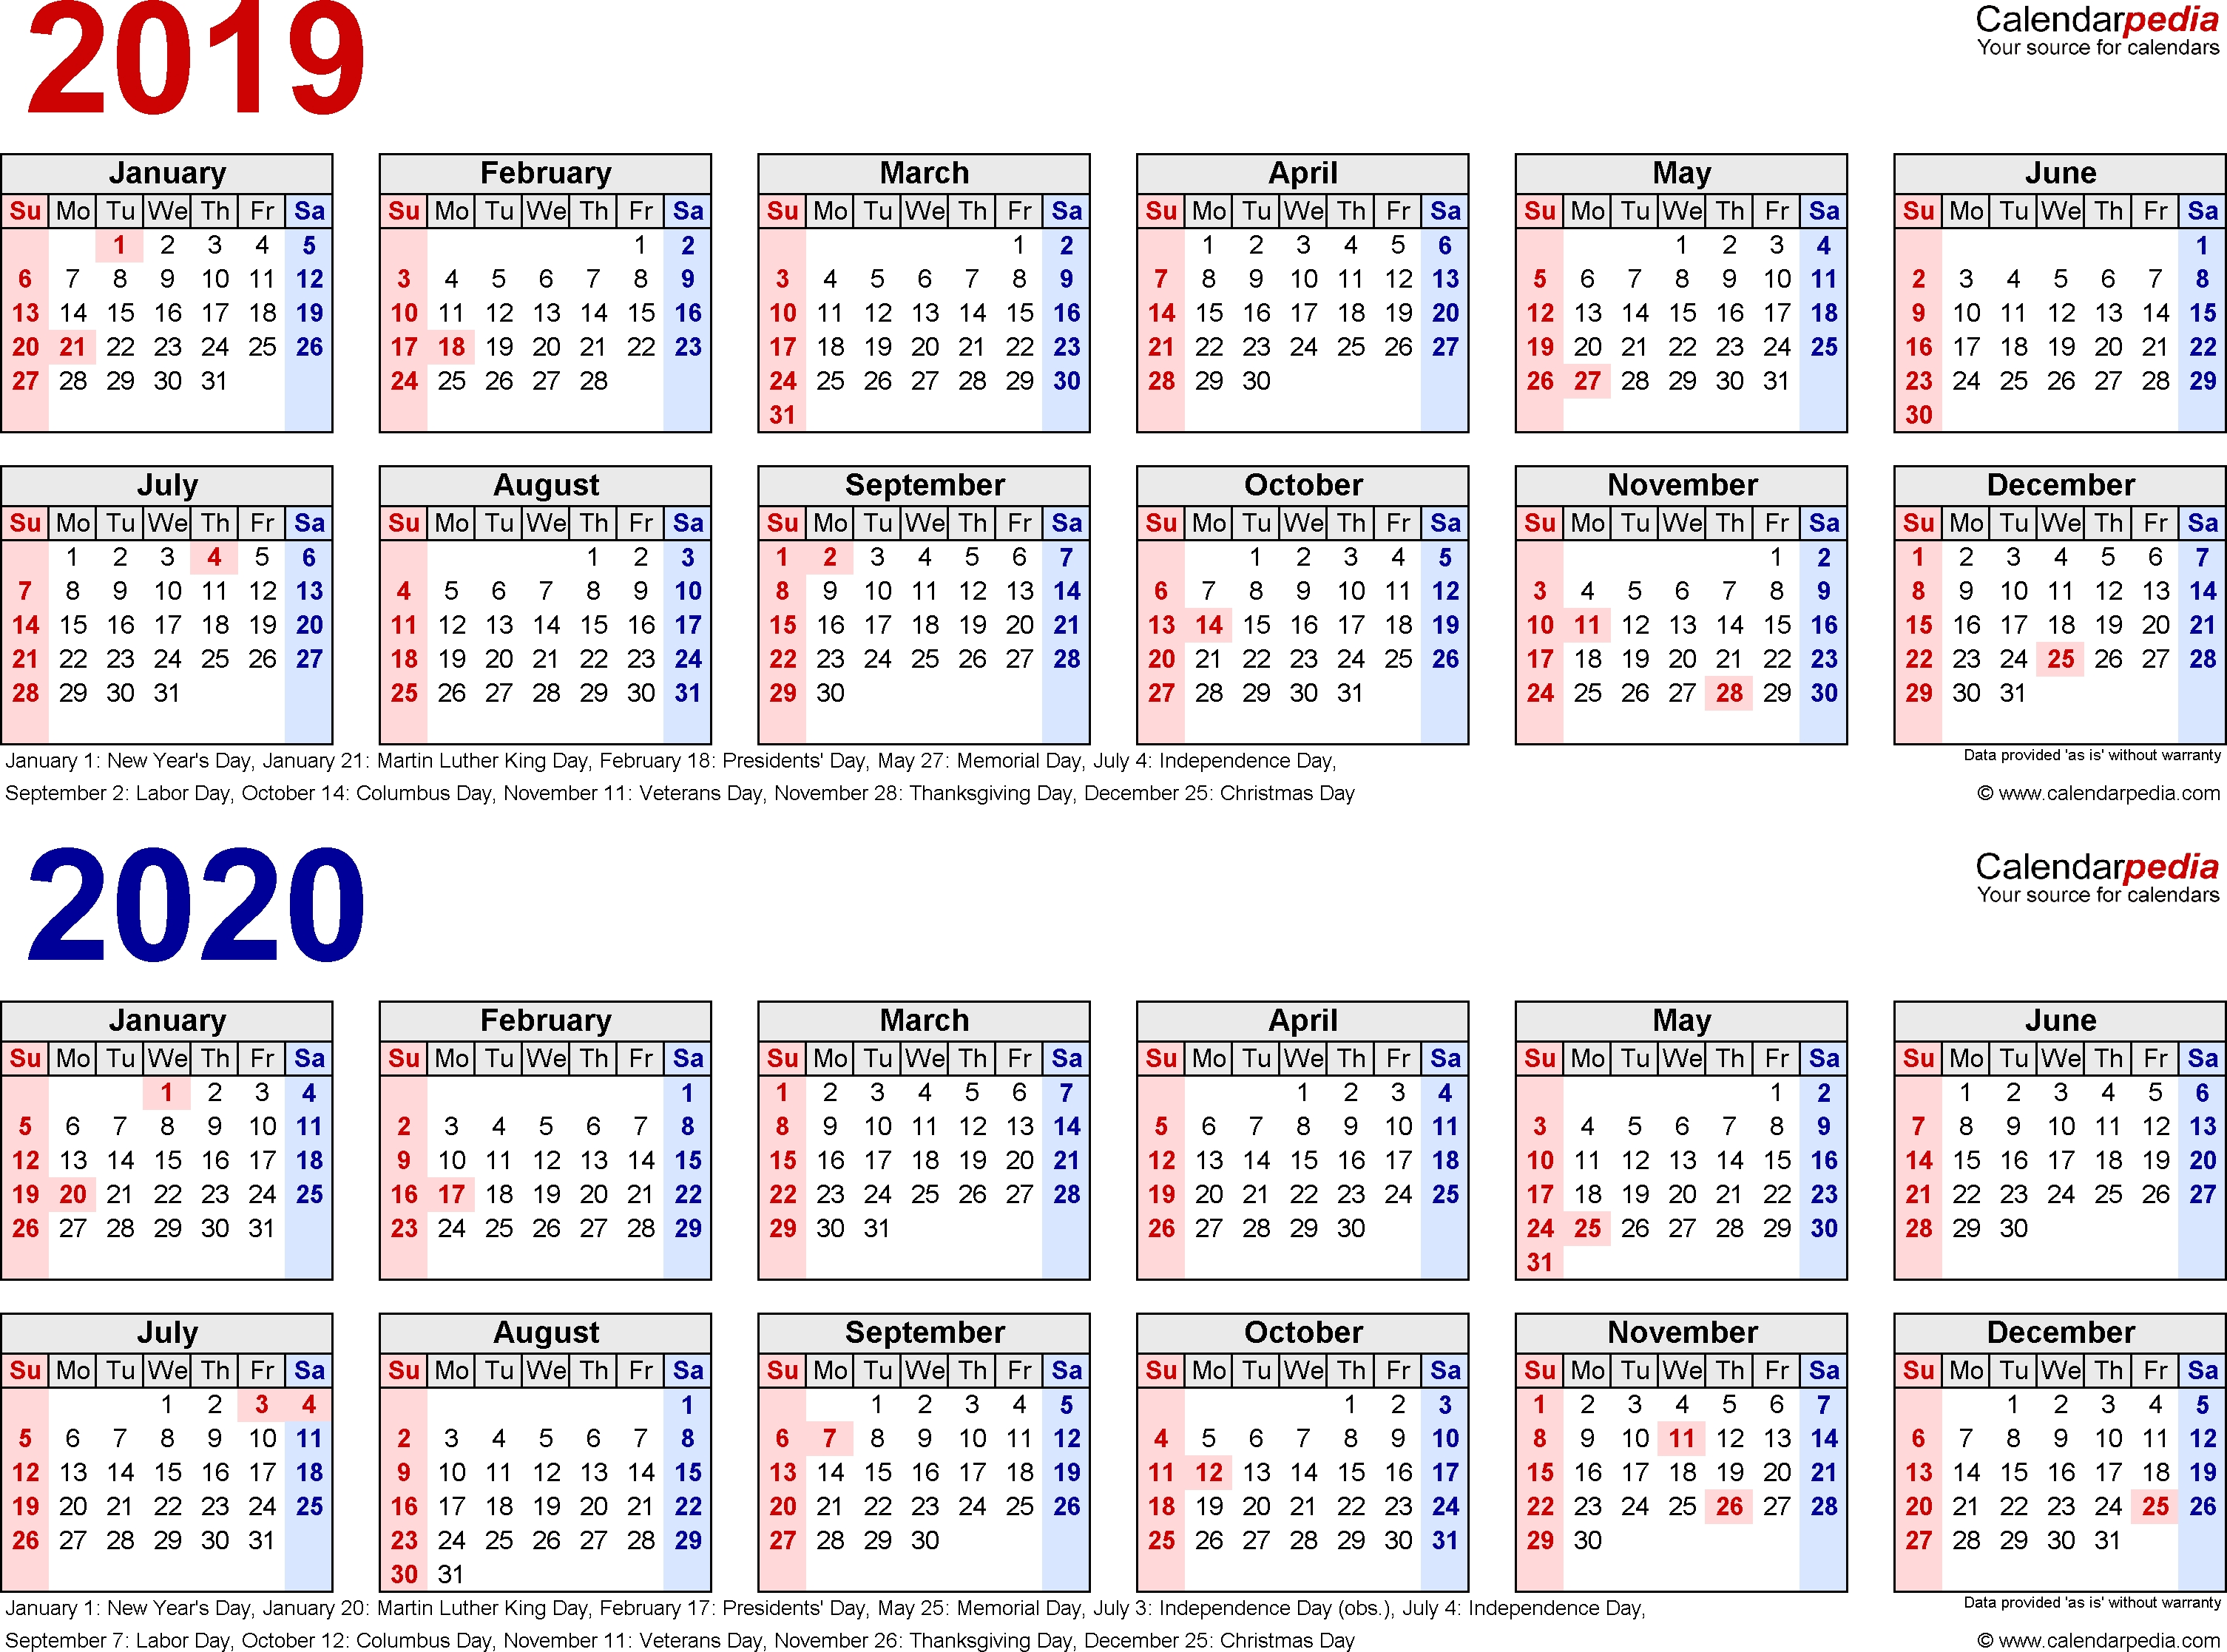 2019-2020 Calendar - Free Printable Two-Year Pdf Calendars regarding Printable Calendar One Week Per Page 2020